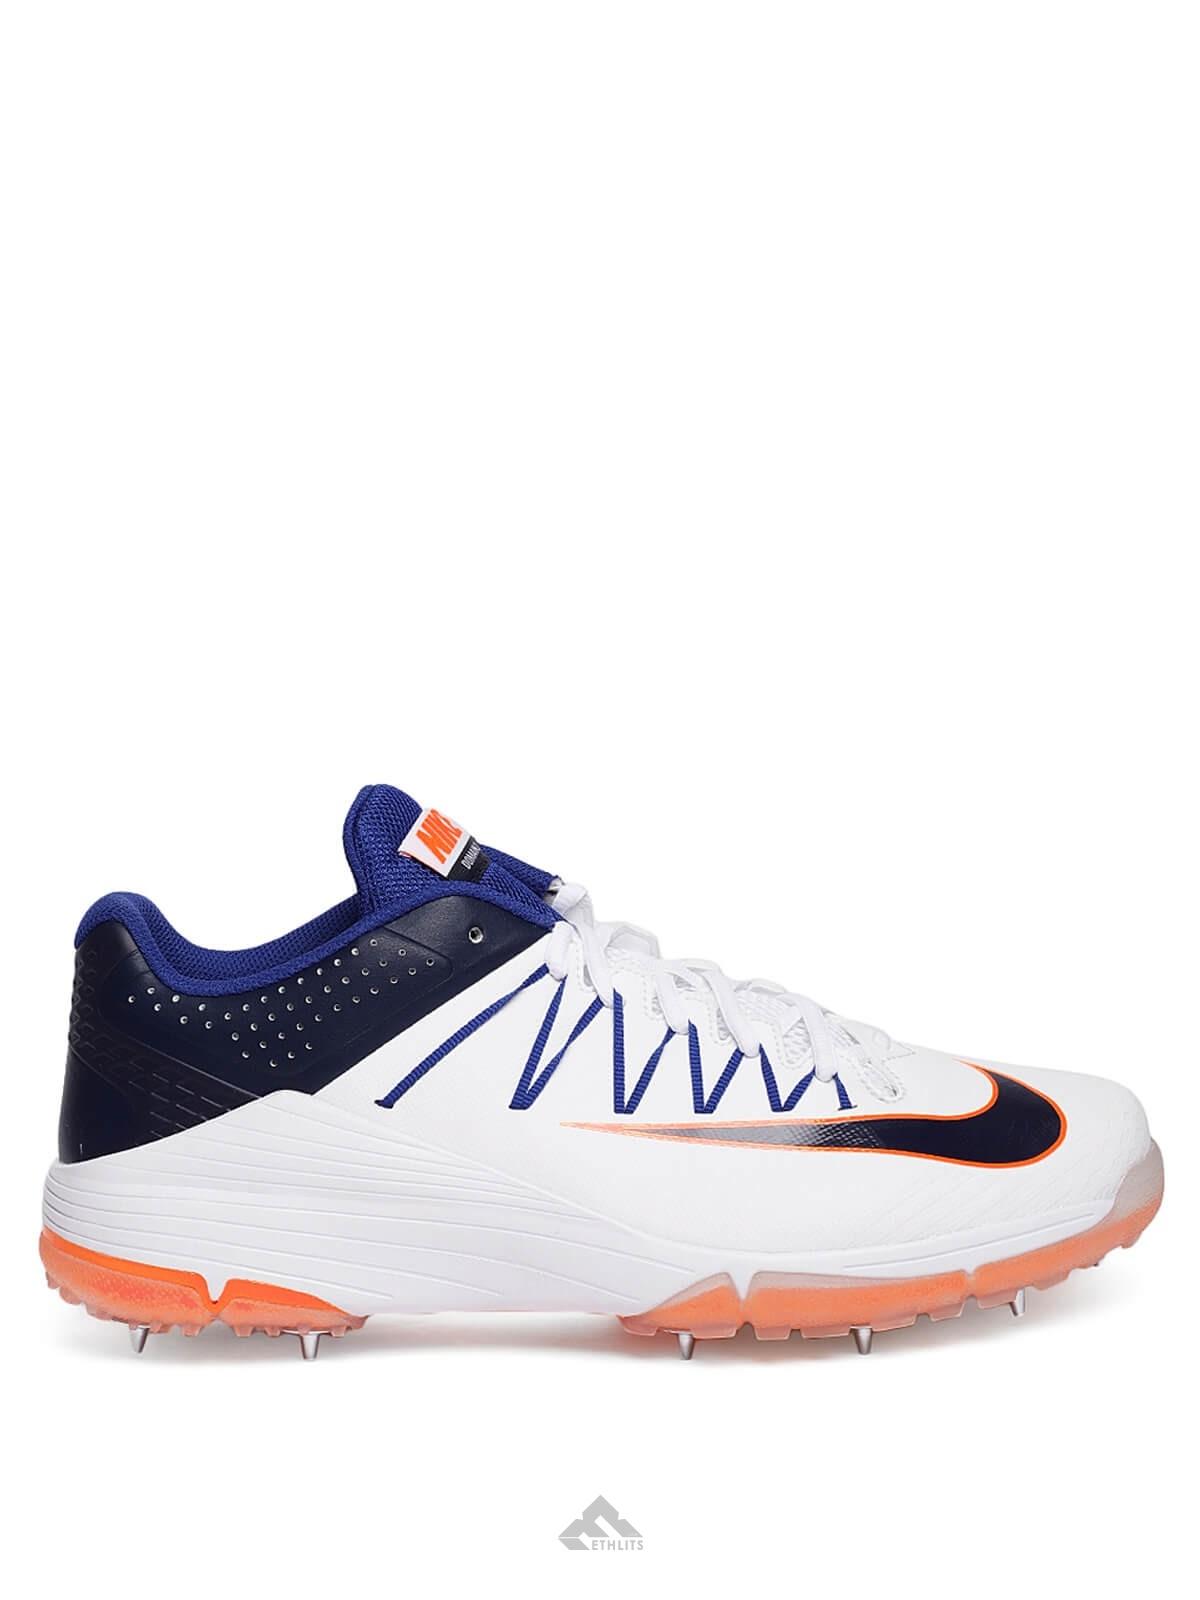 Buy Nike Domain 2 White/Binary Blue